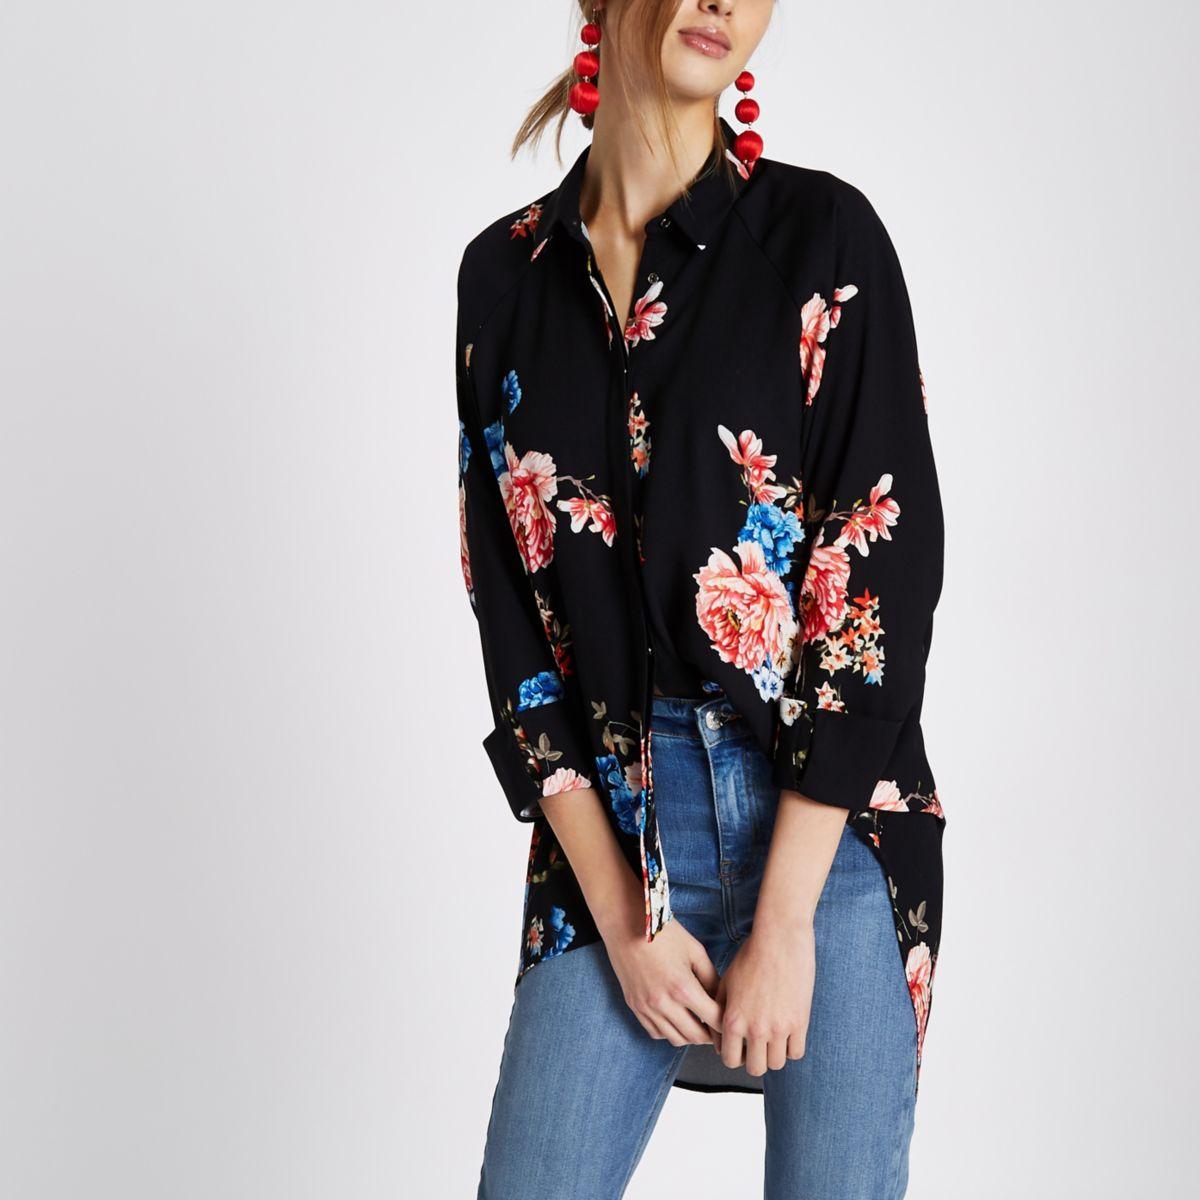 Black floral print high low hem shirt